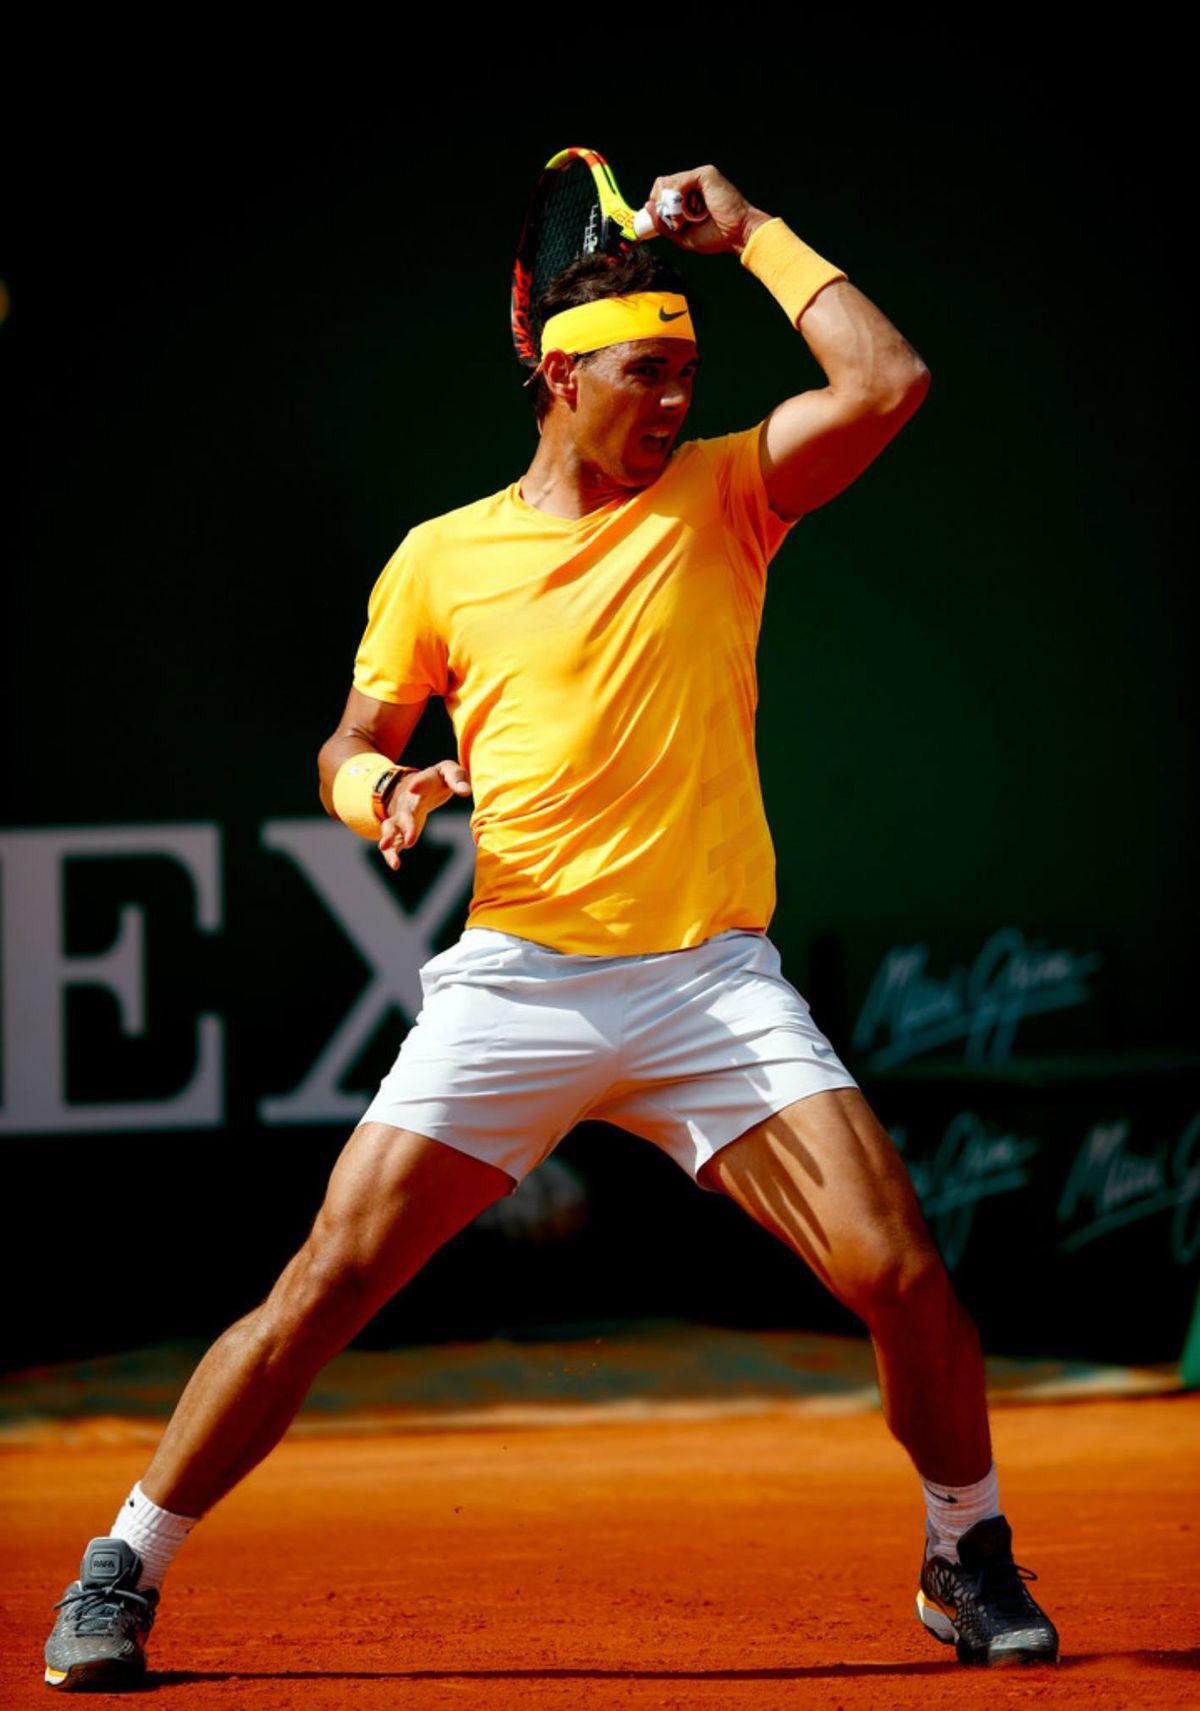 Strong Nadal Tennis Rafael Nadal Rafa Nadal